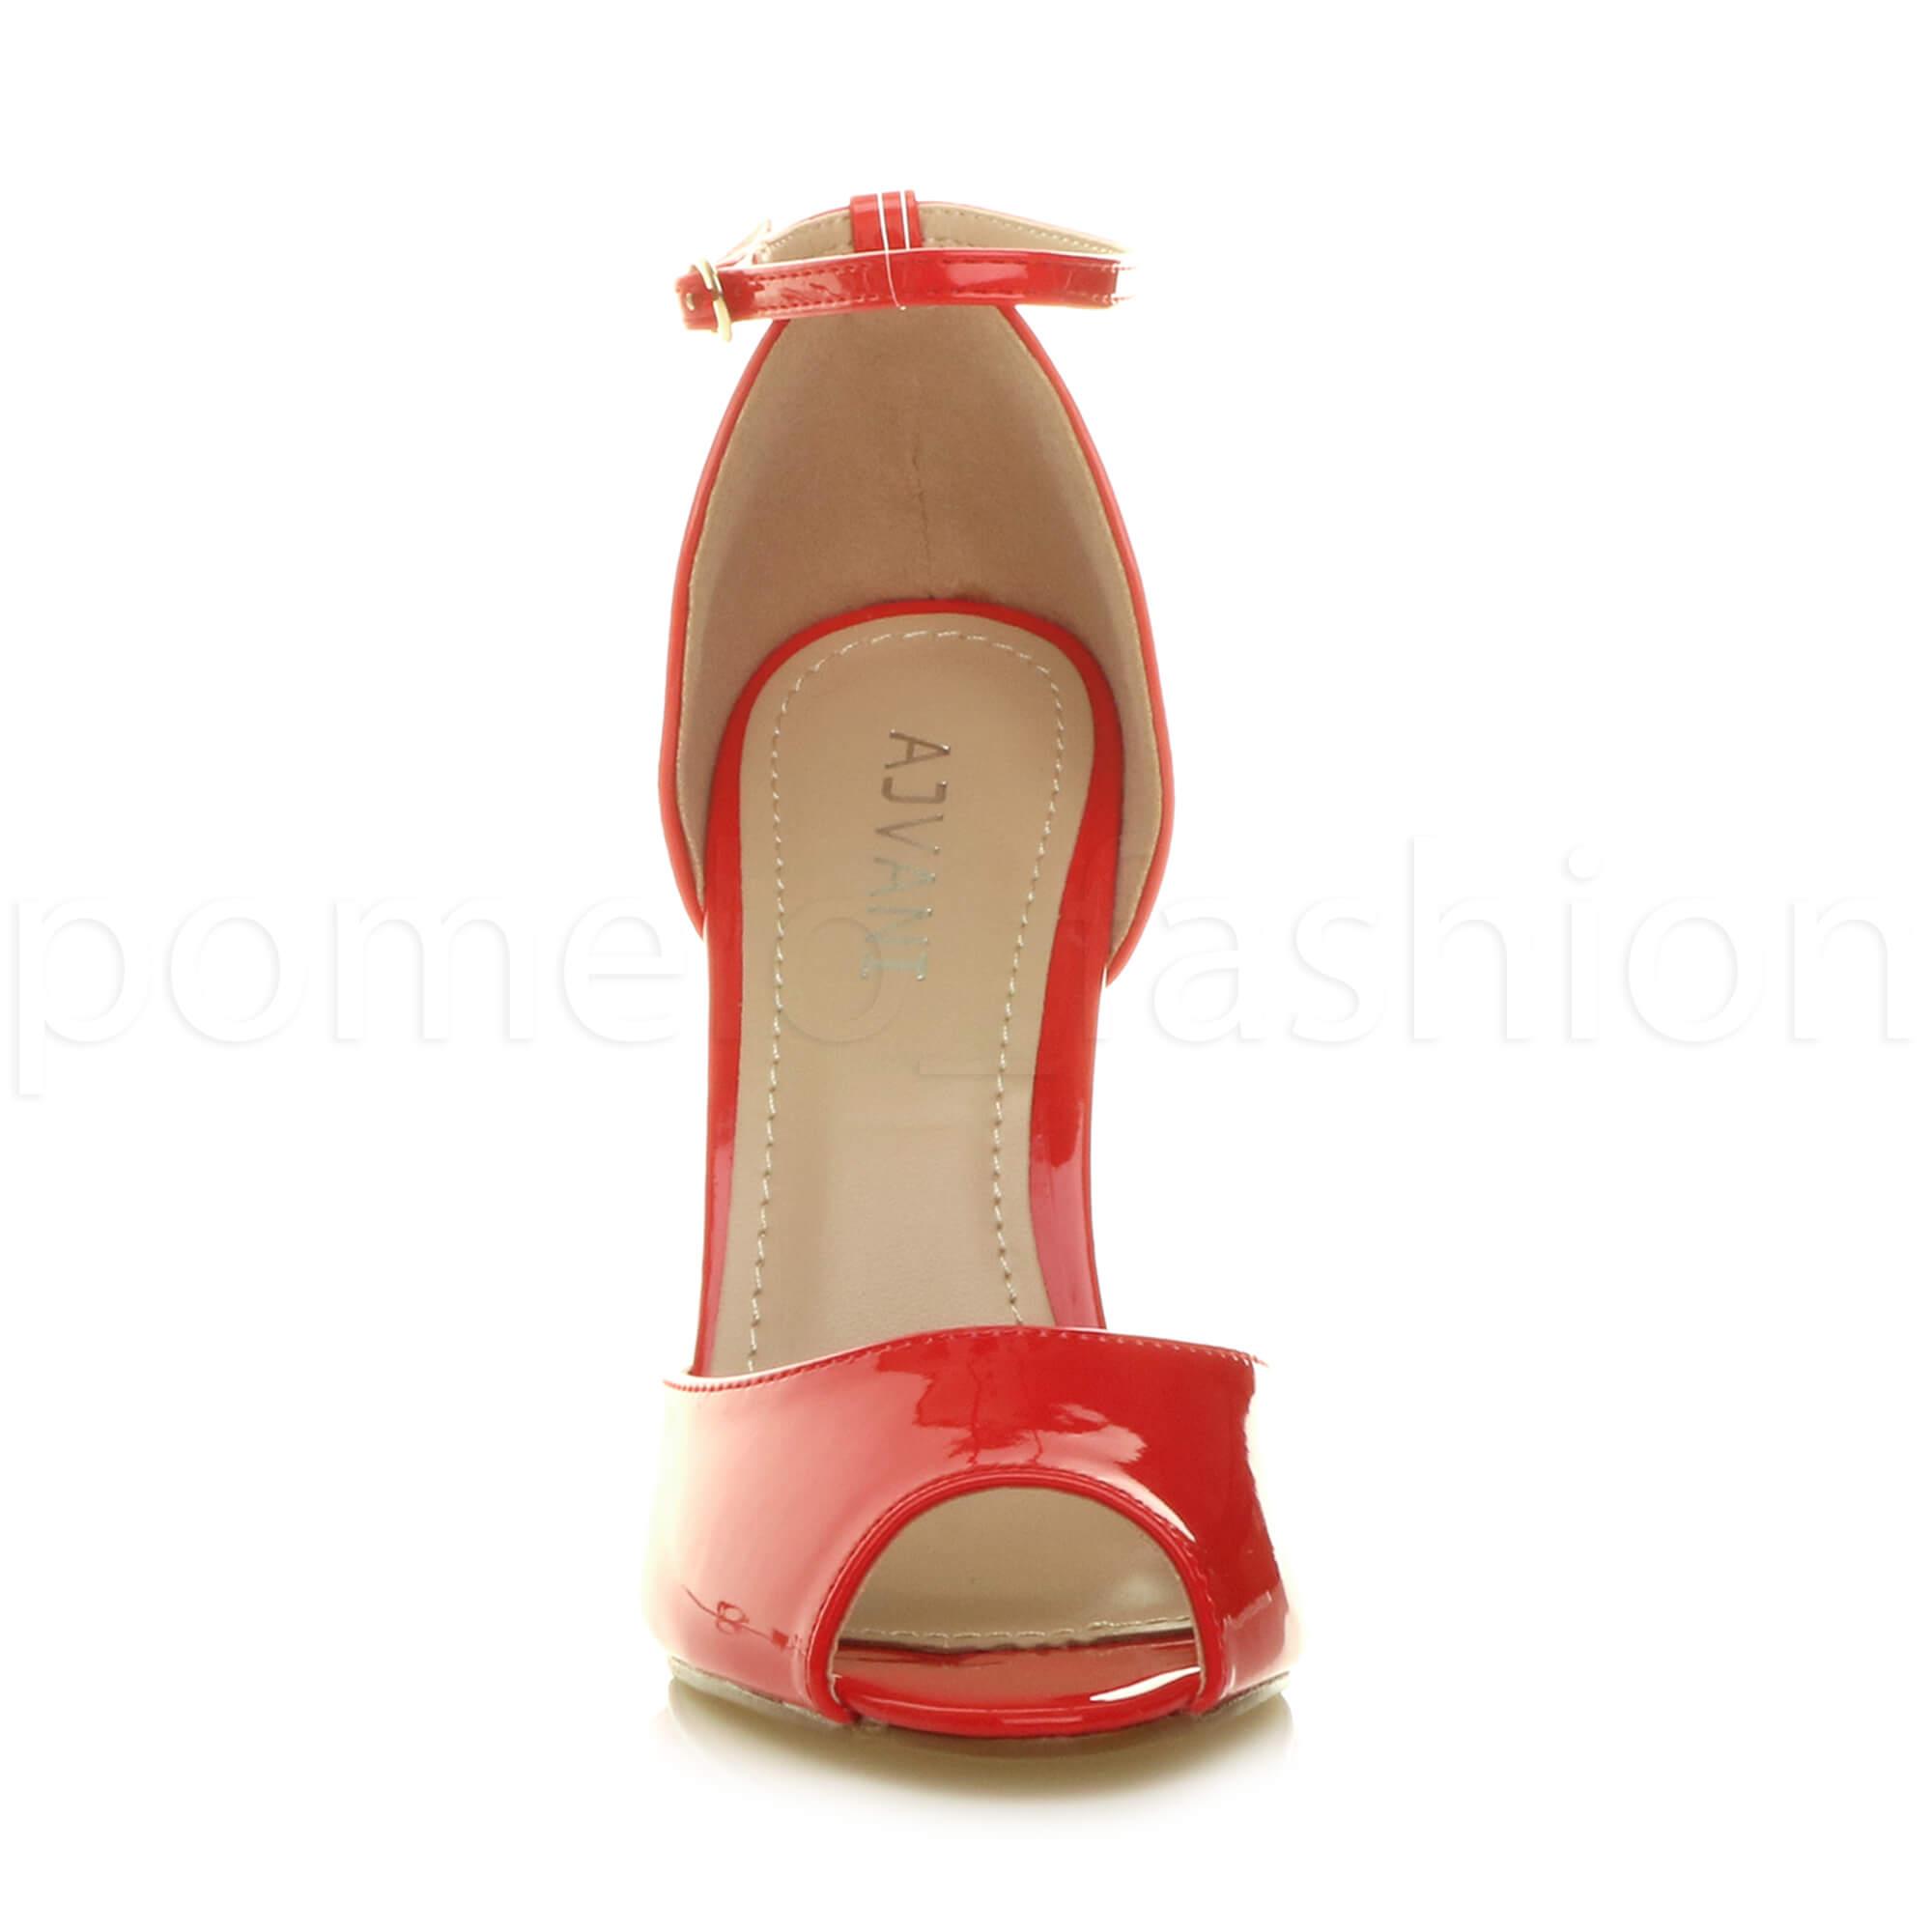 WOMENS-LADIES-HIGH-HEEL-WEDDING-BRIDESMAID-EVENING-STILETTOS-PEEP-TOE-SHOES-SIZE thumbnail 62